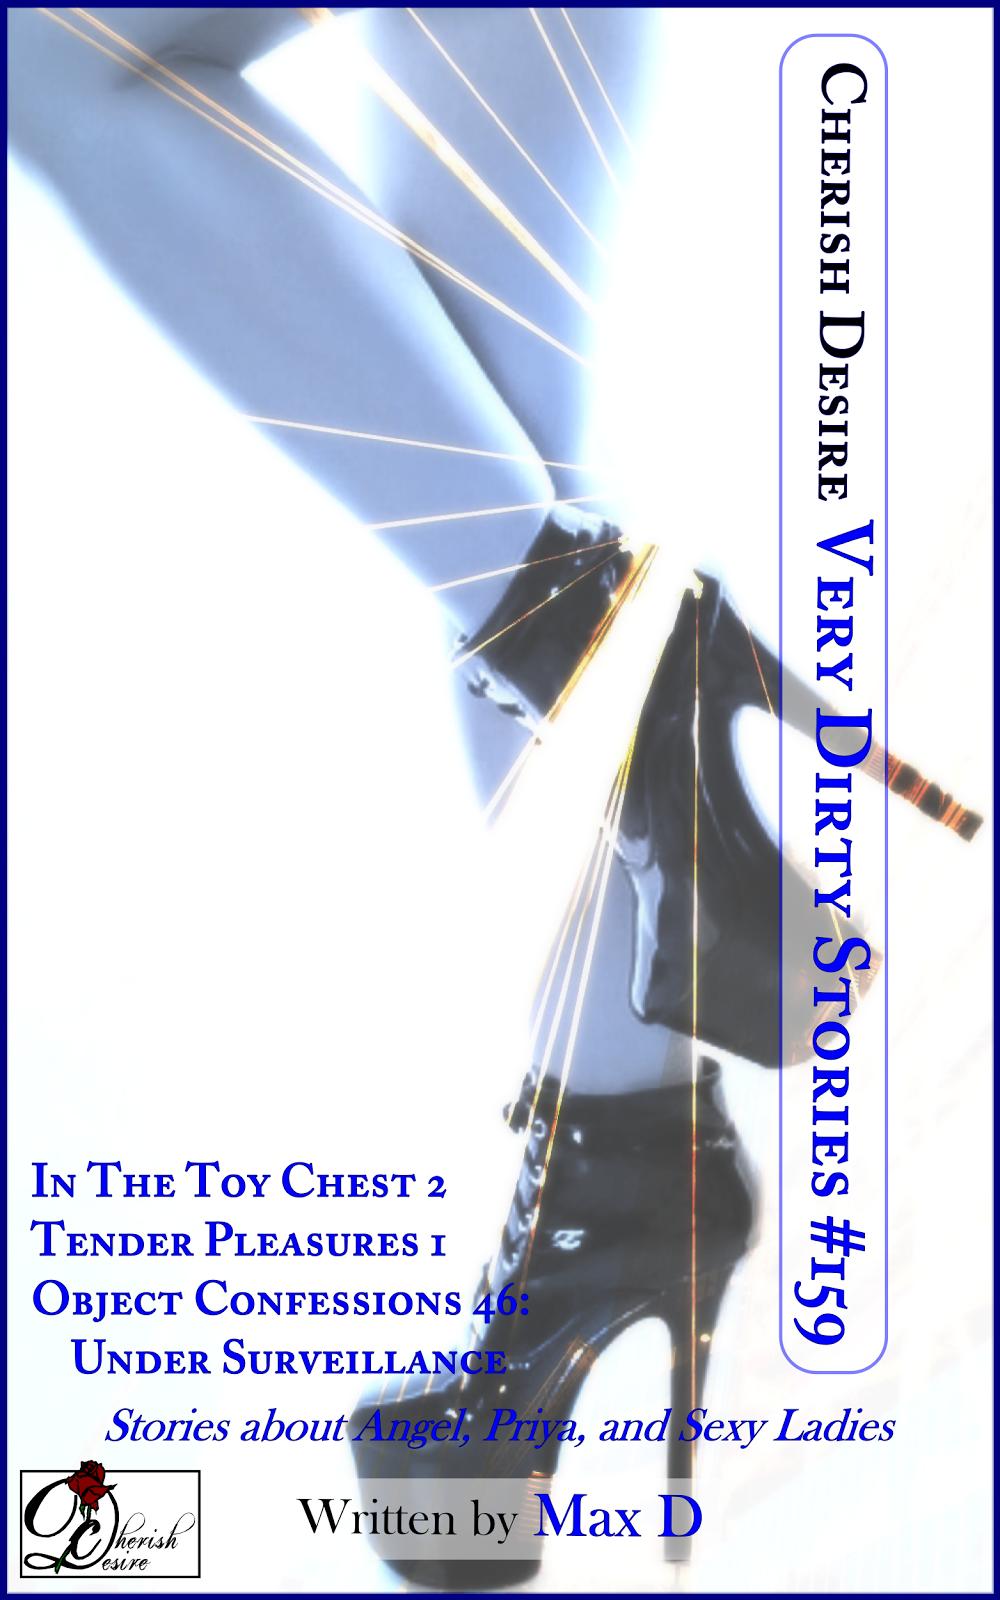 Cherish Desire: Very Dirty Stories #159, Max D, erotica